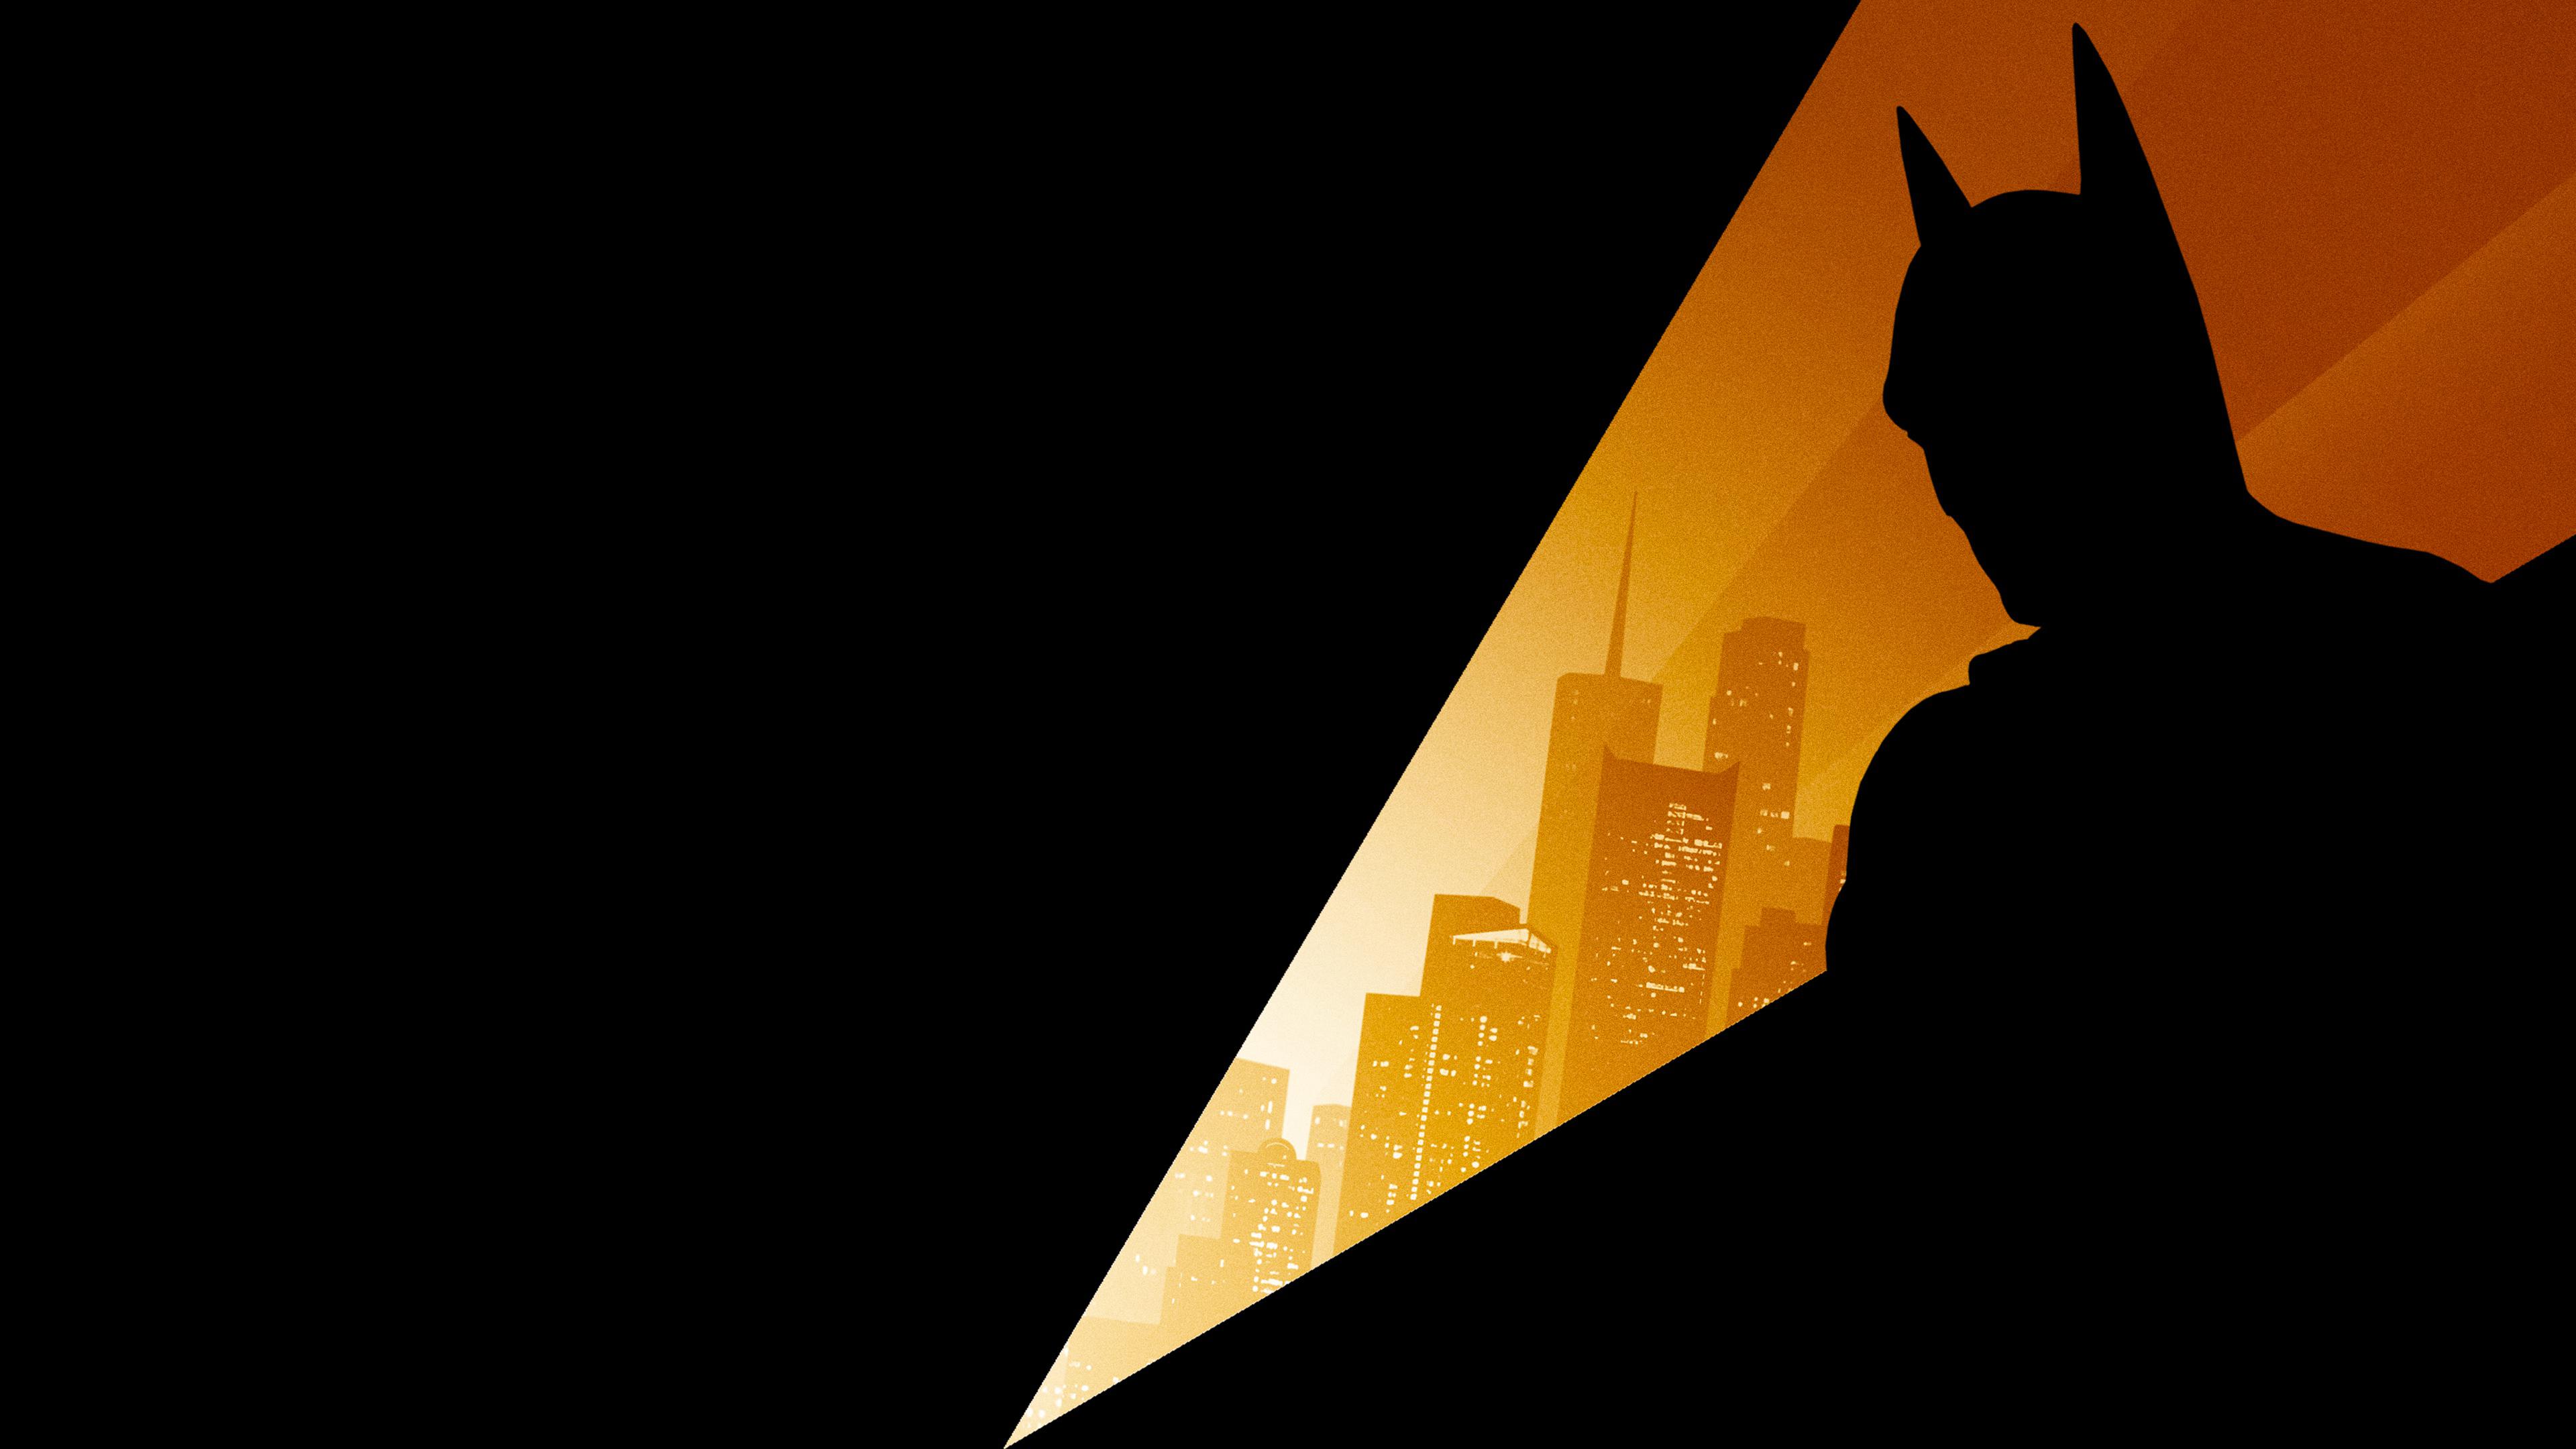 batman silhouette 1581357340 - Batman Silhouette - Batman Silhouette wallpapers, Batman Silhouette background 4k, Batman Silhouette 4k wallpapers